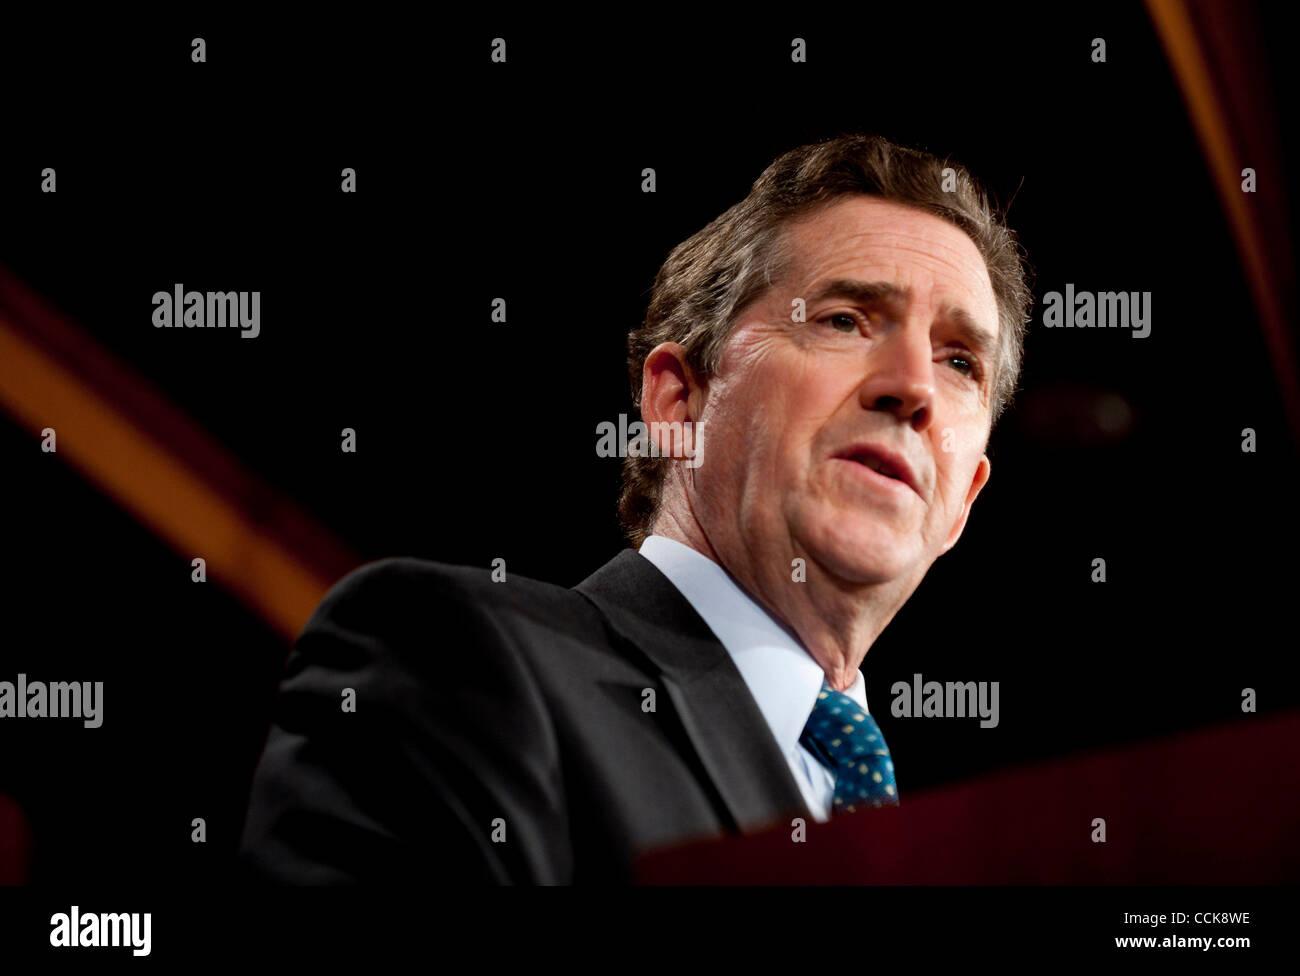 Dec 2, 2010 - Washington, Distrito de Columbia, el senador. JIM DEMINT (R-SC) habla a la prensa sobre la ''Ley Imagen De Stock